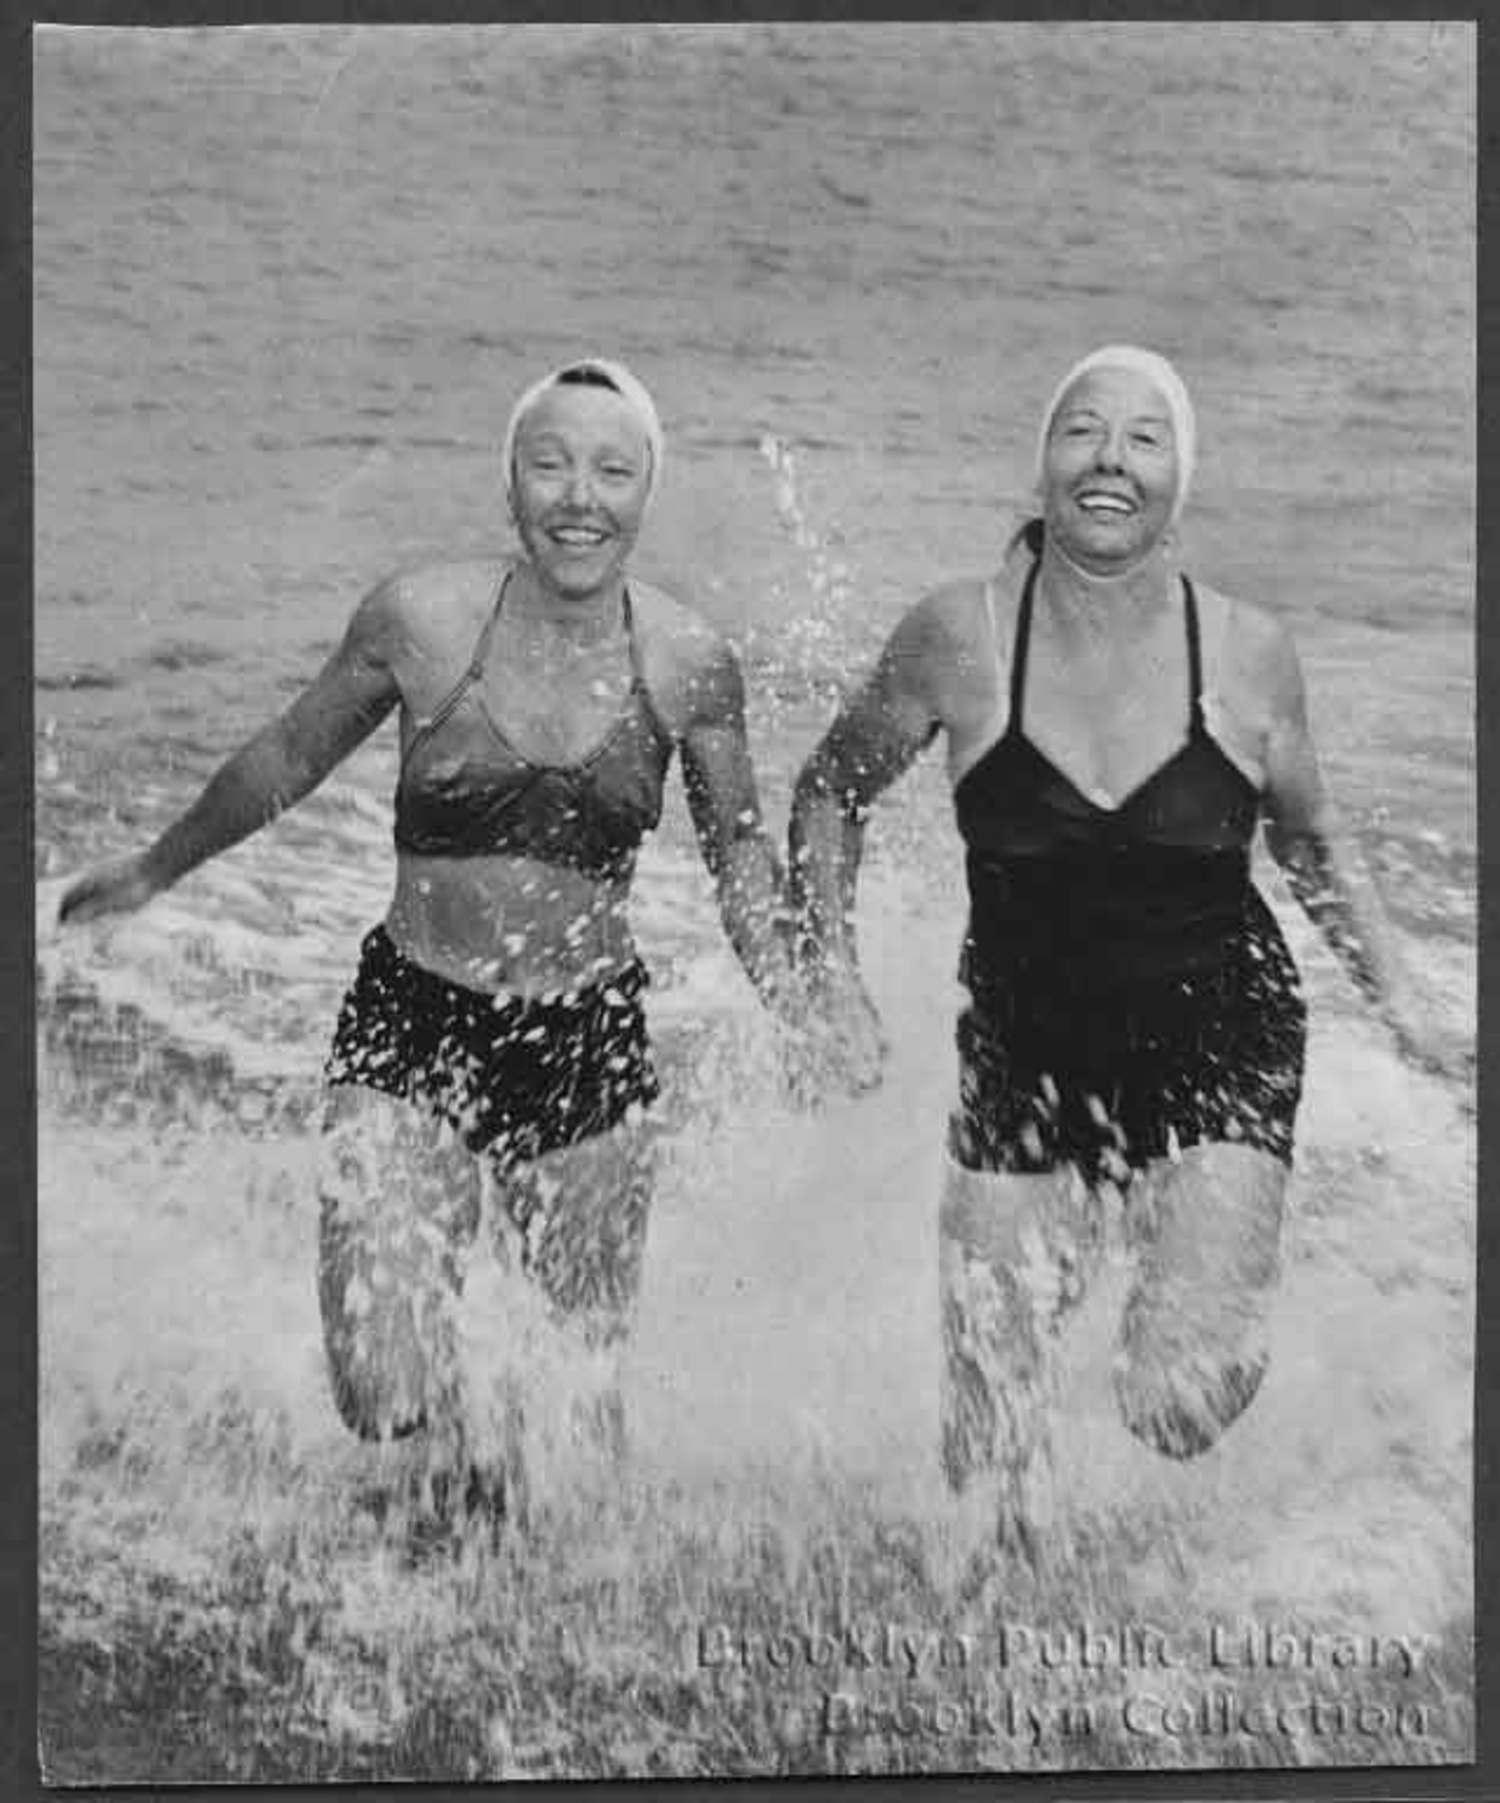 Splish splash, 1948-style.